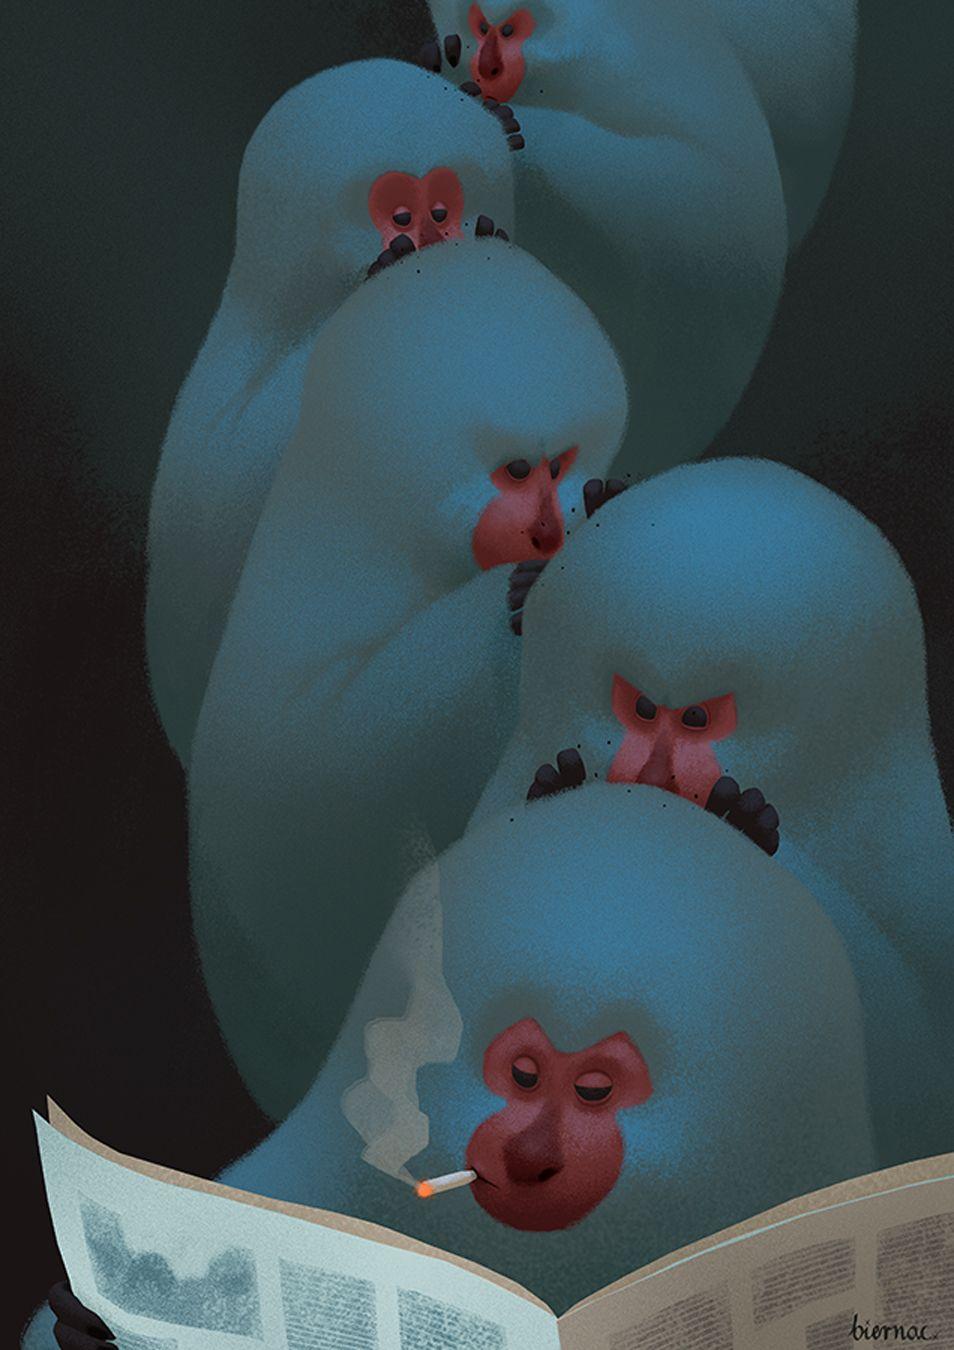 The Art Of Animation, Szymon Biernacki